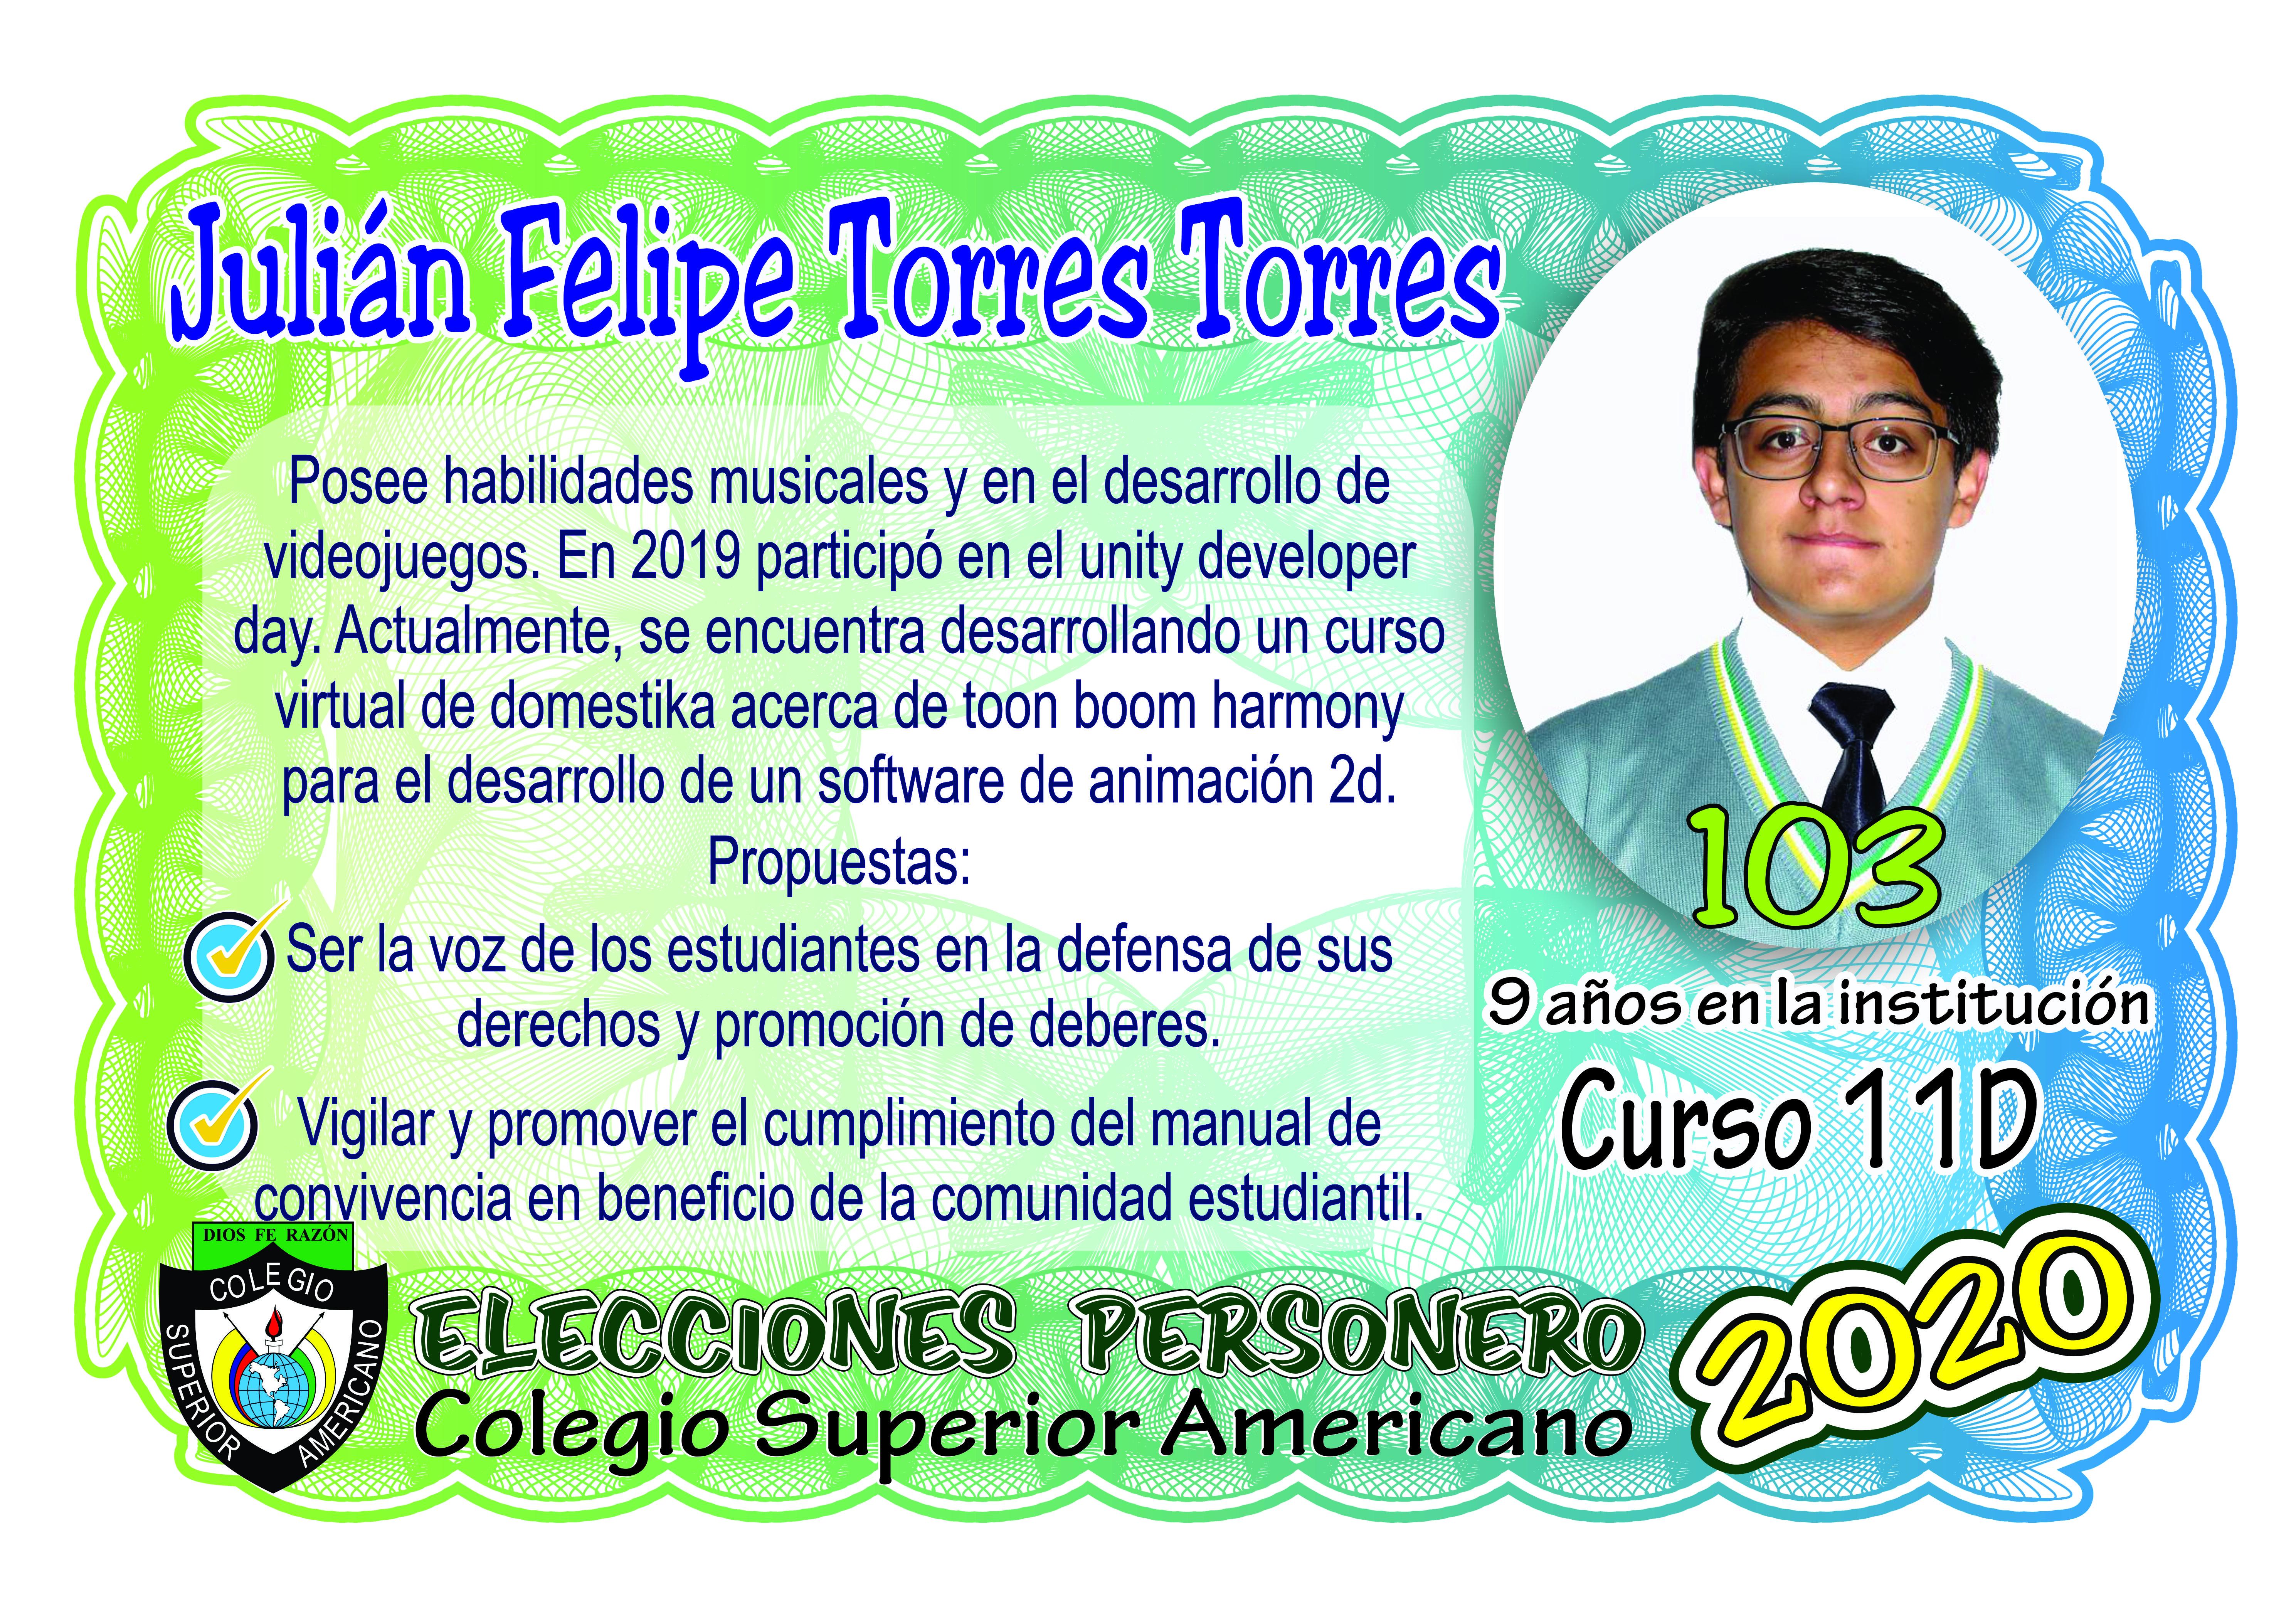 Julián Felipe Torres Torres.jpg